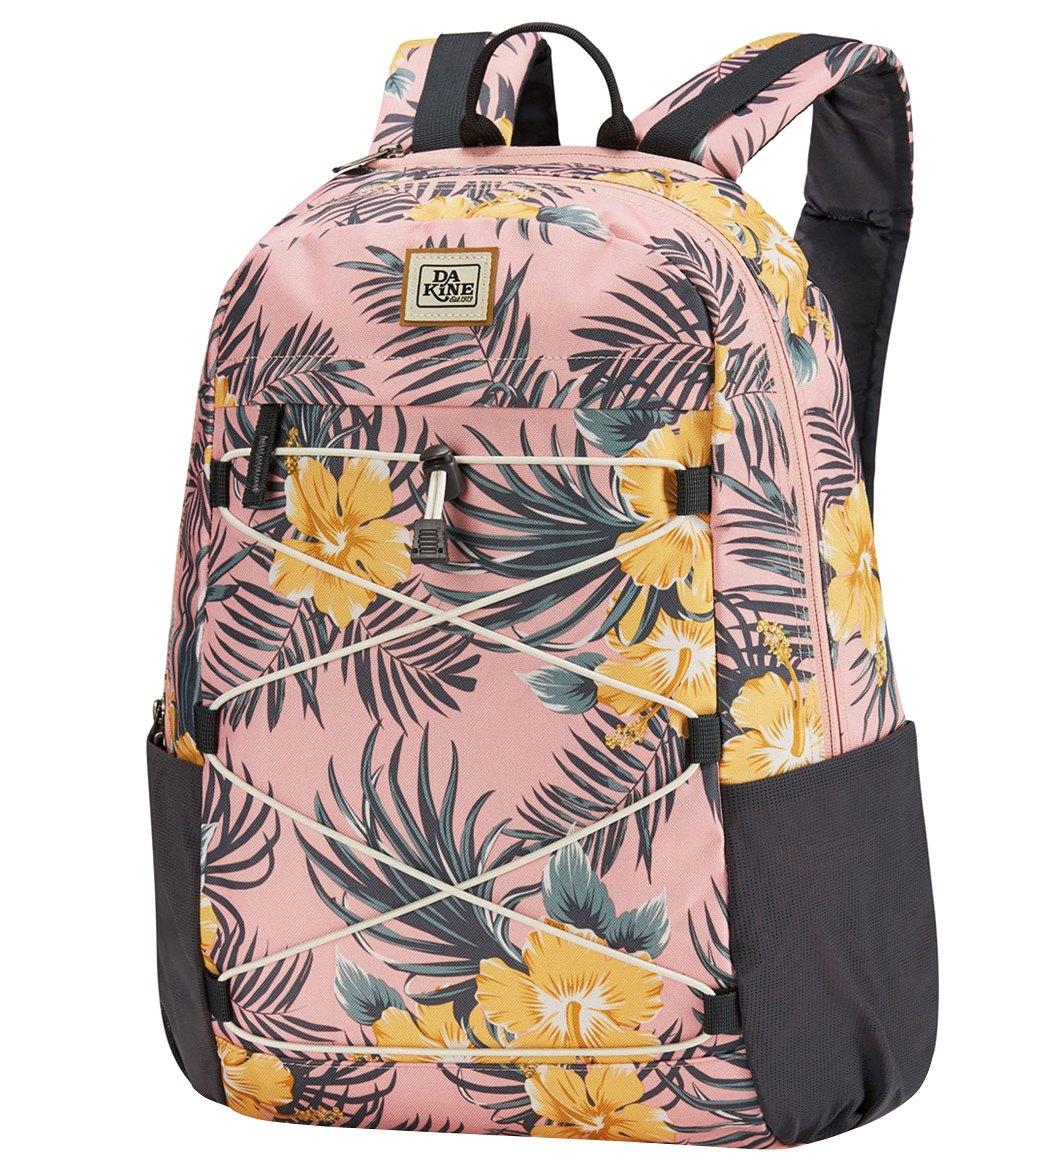 Dakine Wonder 22L Backpack at SwimOutlet.com fa9218a3cb8